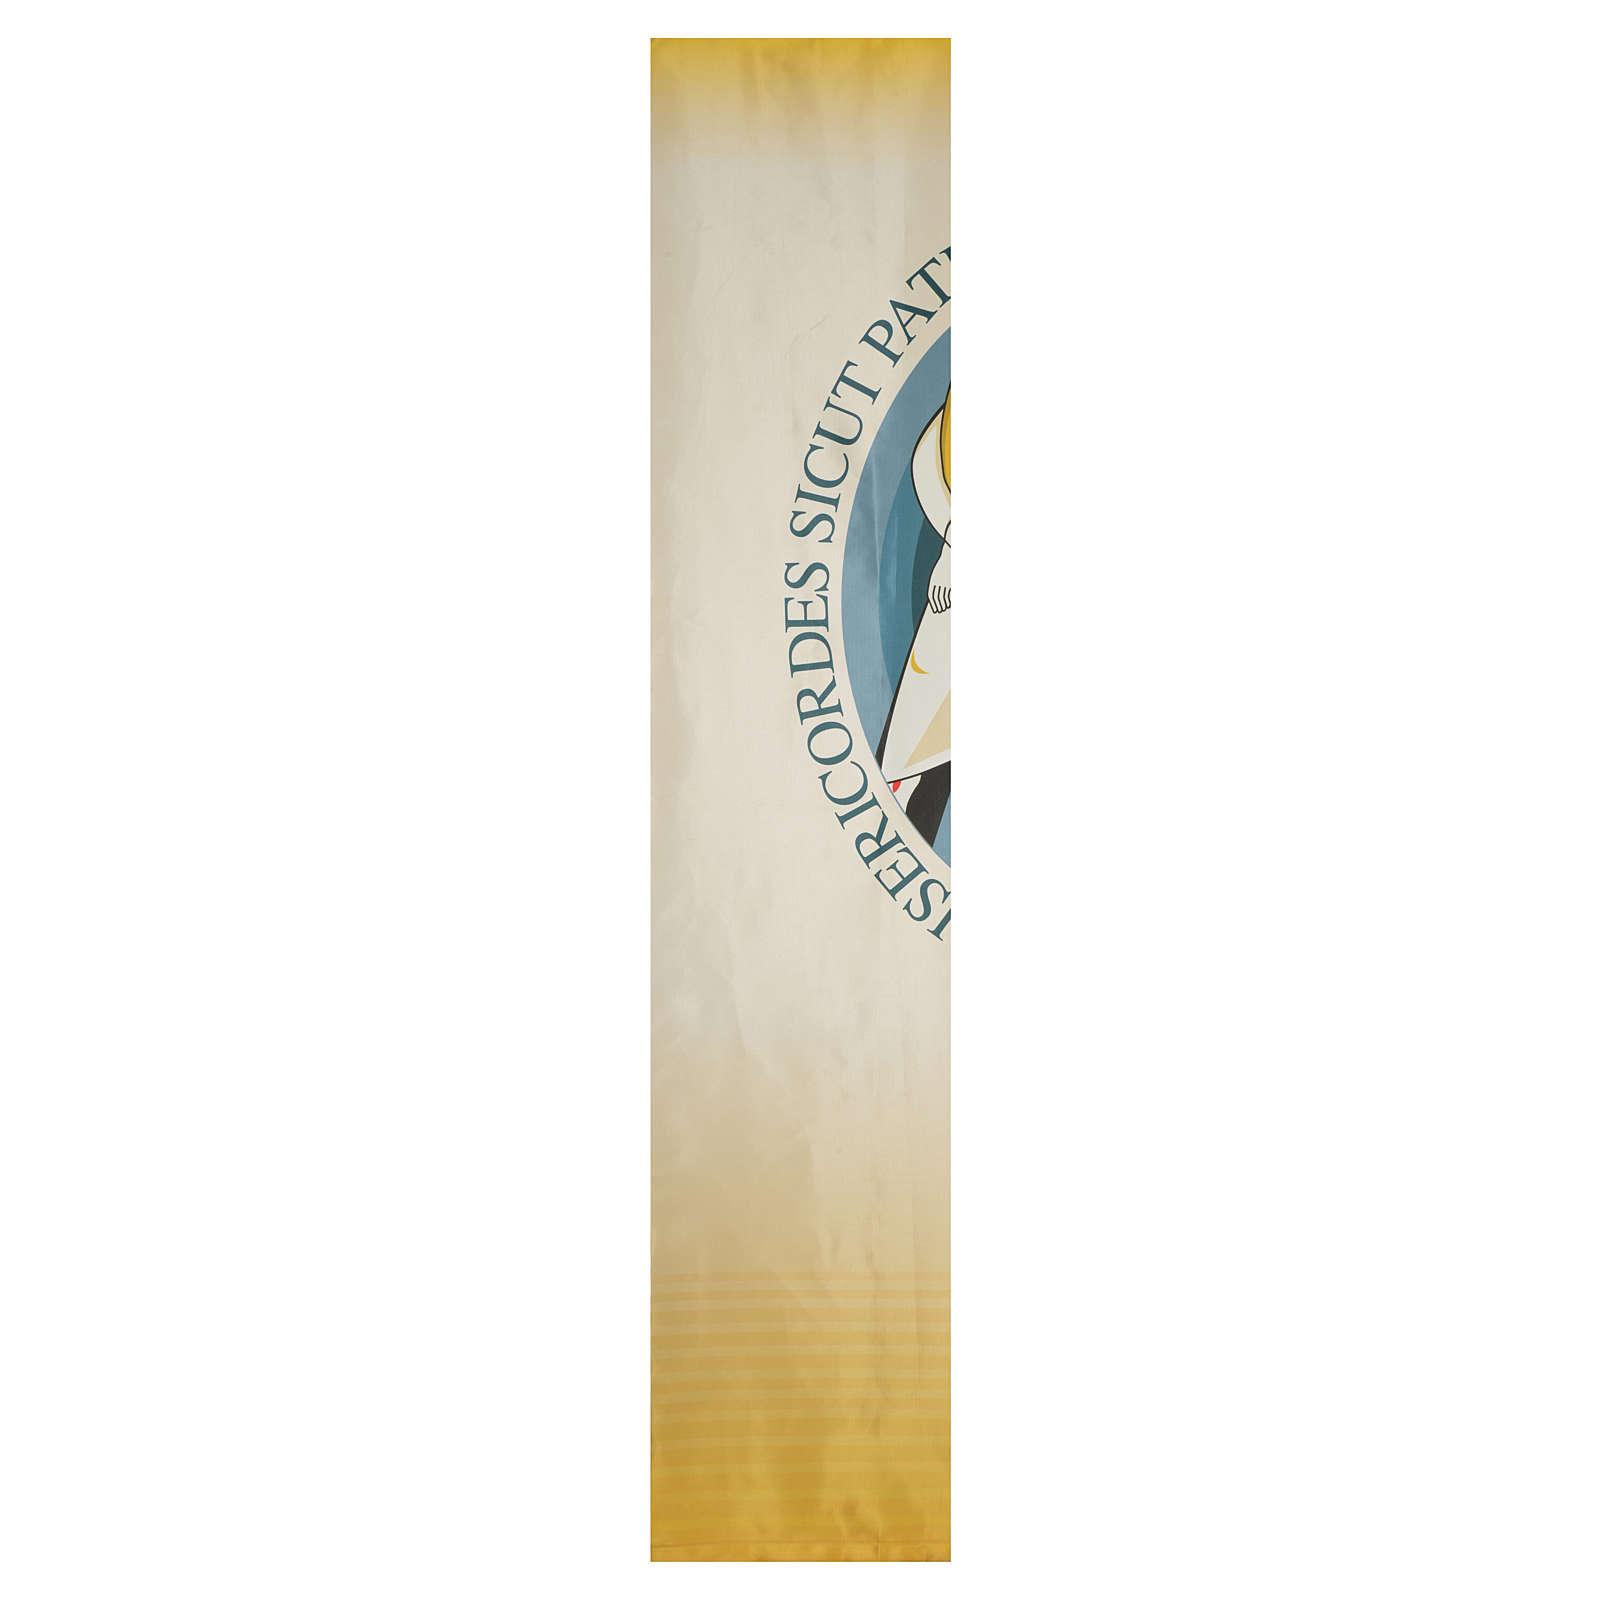 STOCK Logo Giubileo Misericordia LATINO su tessuto 135x300 cm stampa 3